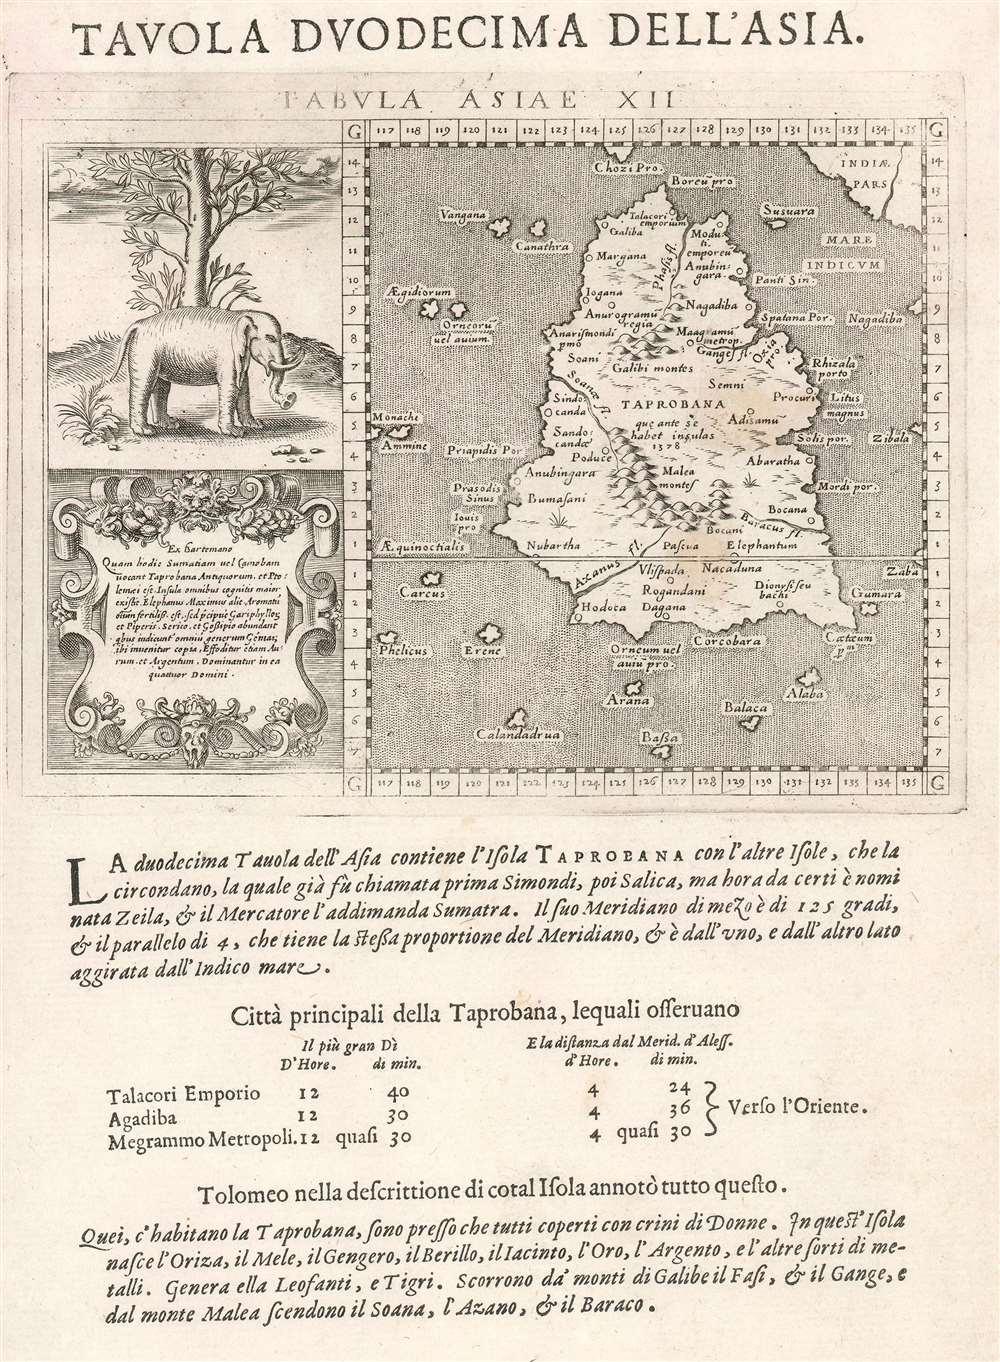 1598 Magini Map of Sumatra/ Sri Lanka according to Ptolemy